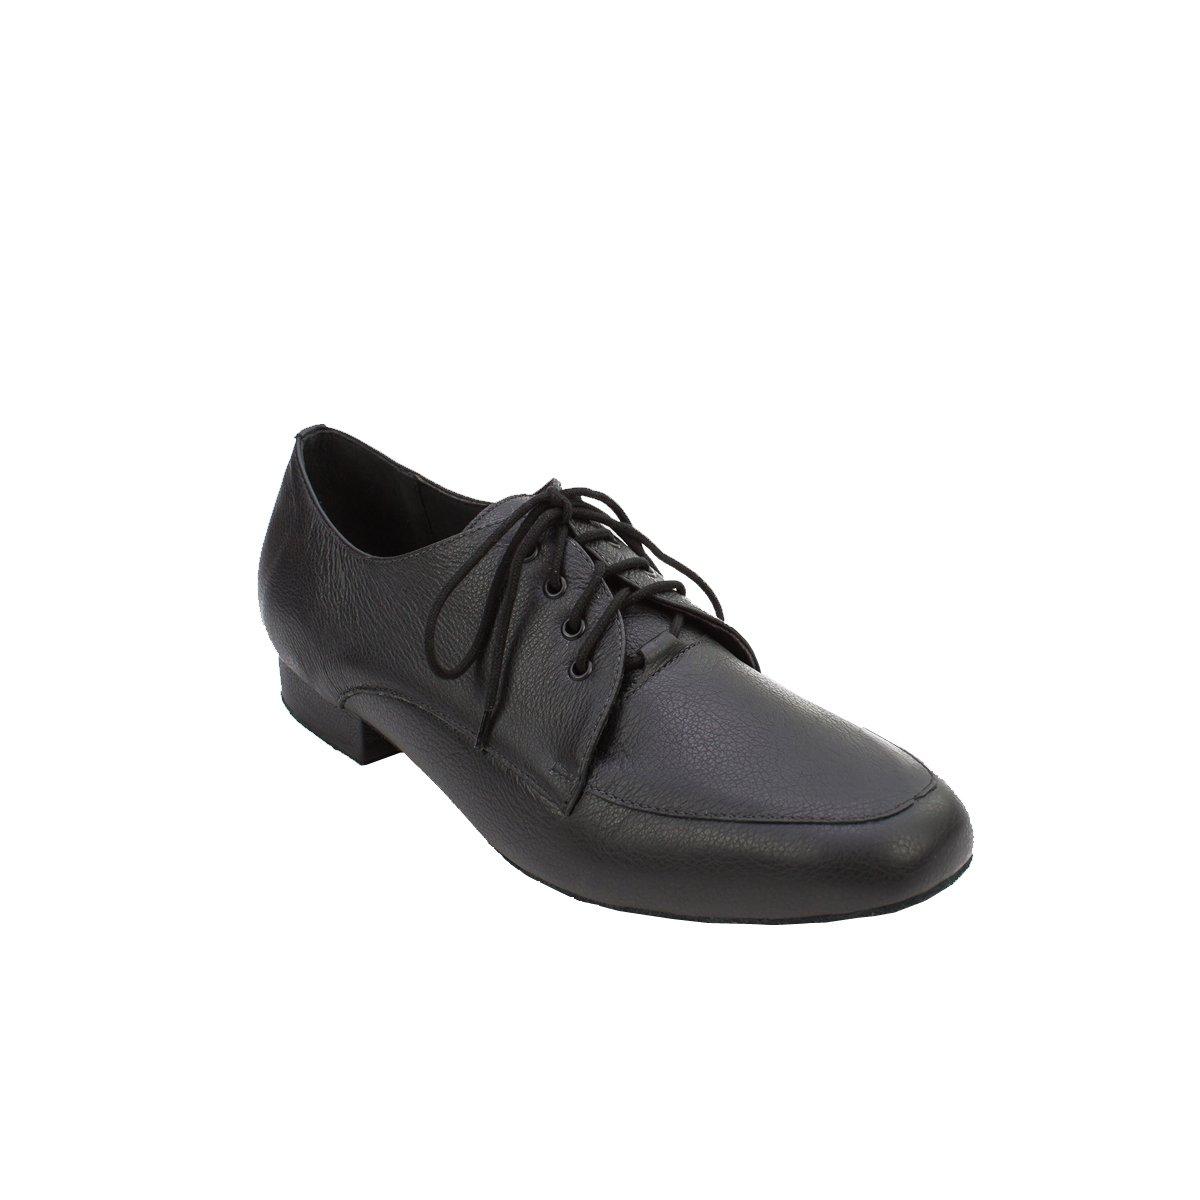 Sodanca Bl-102 Mens Robbie Classic Leather Ballroom Shoe